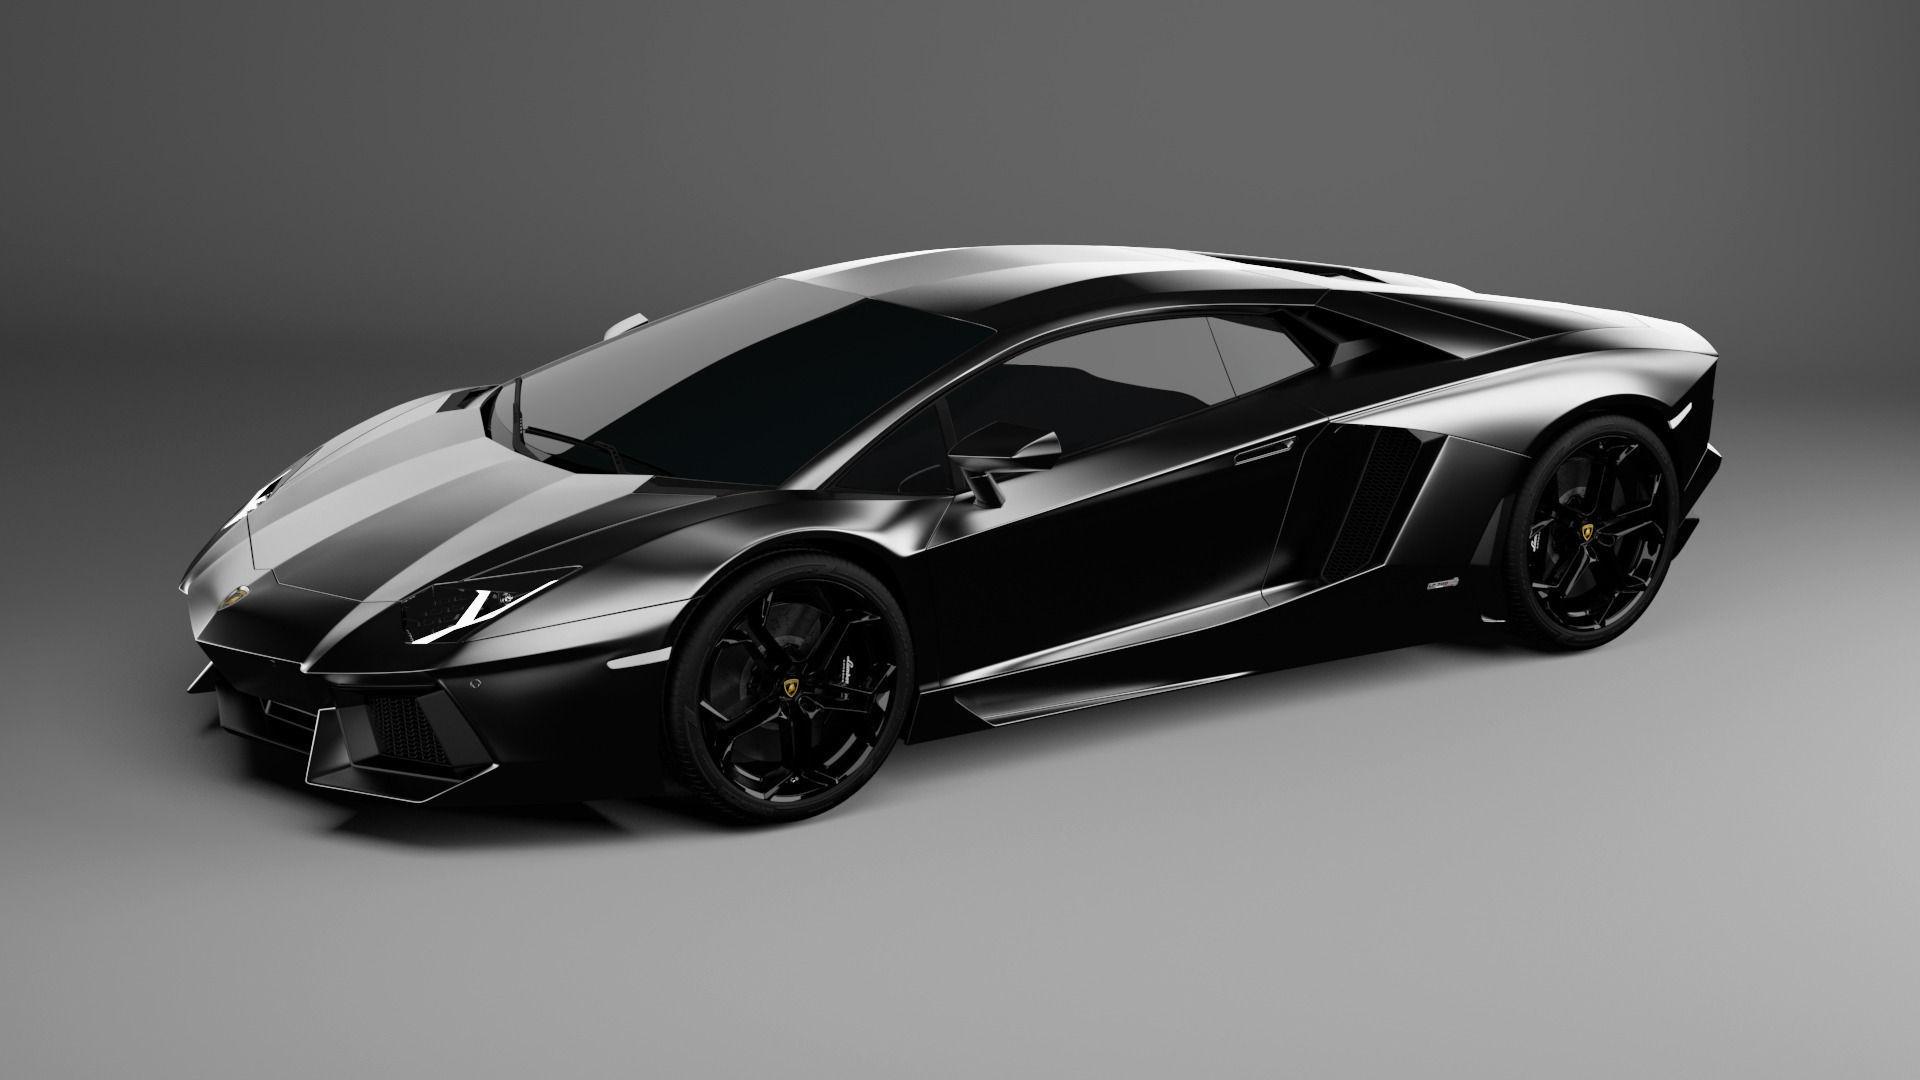 3d Lamborghini Aventador Lp 700 4 Cgtrader